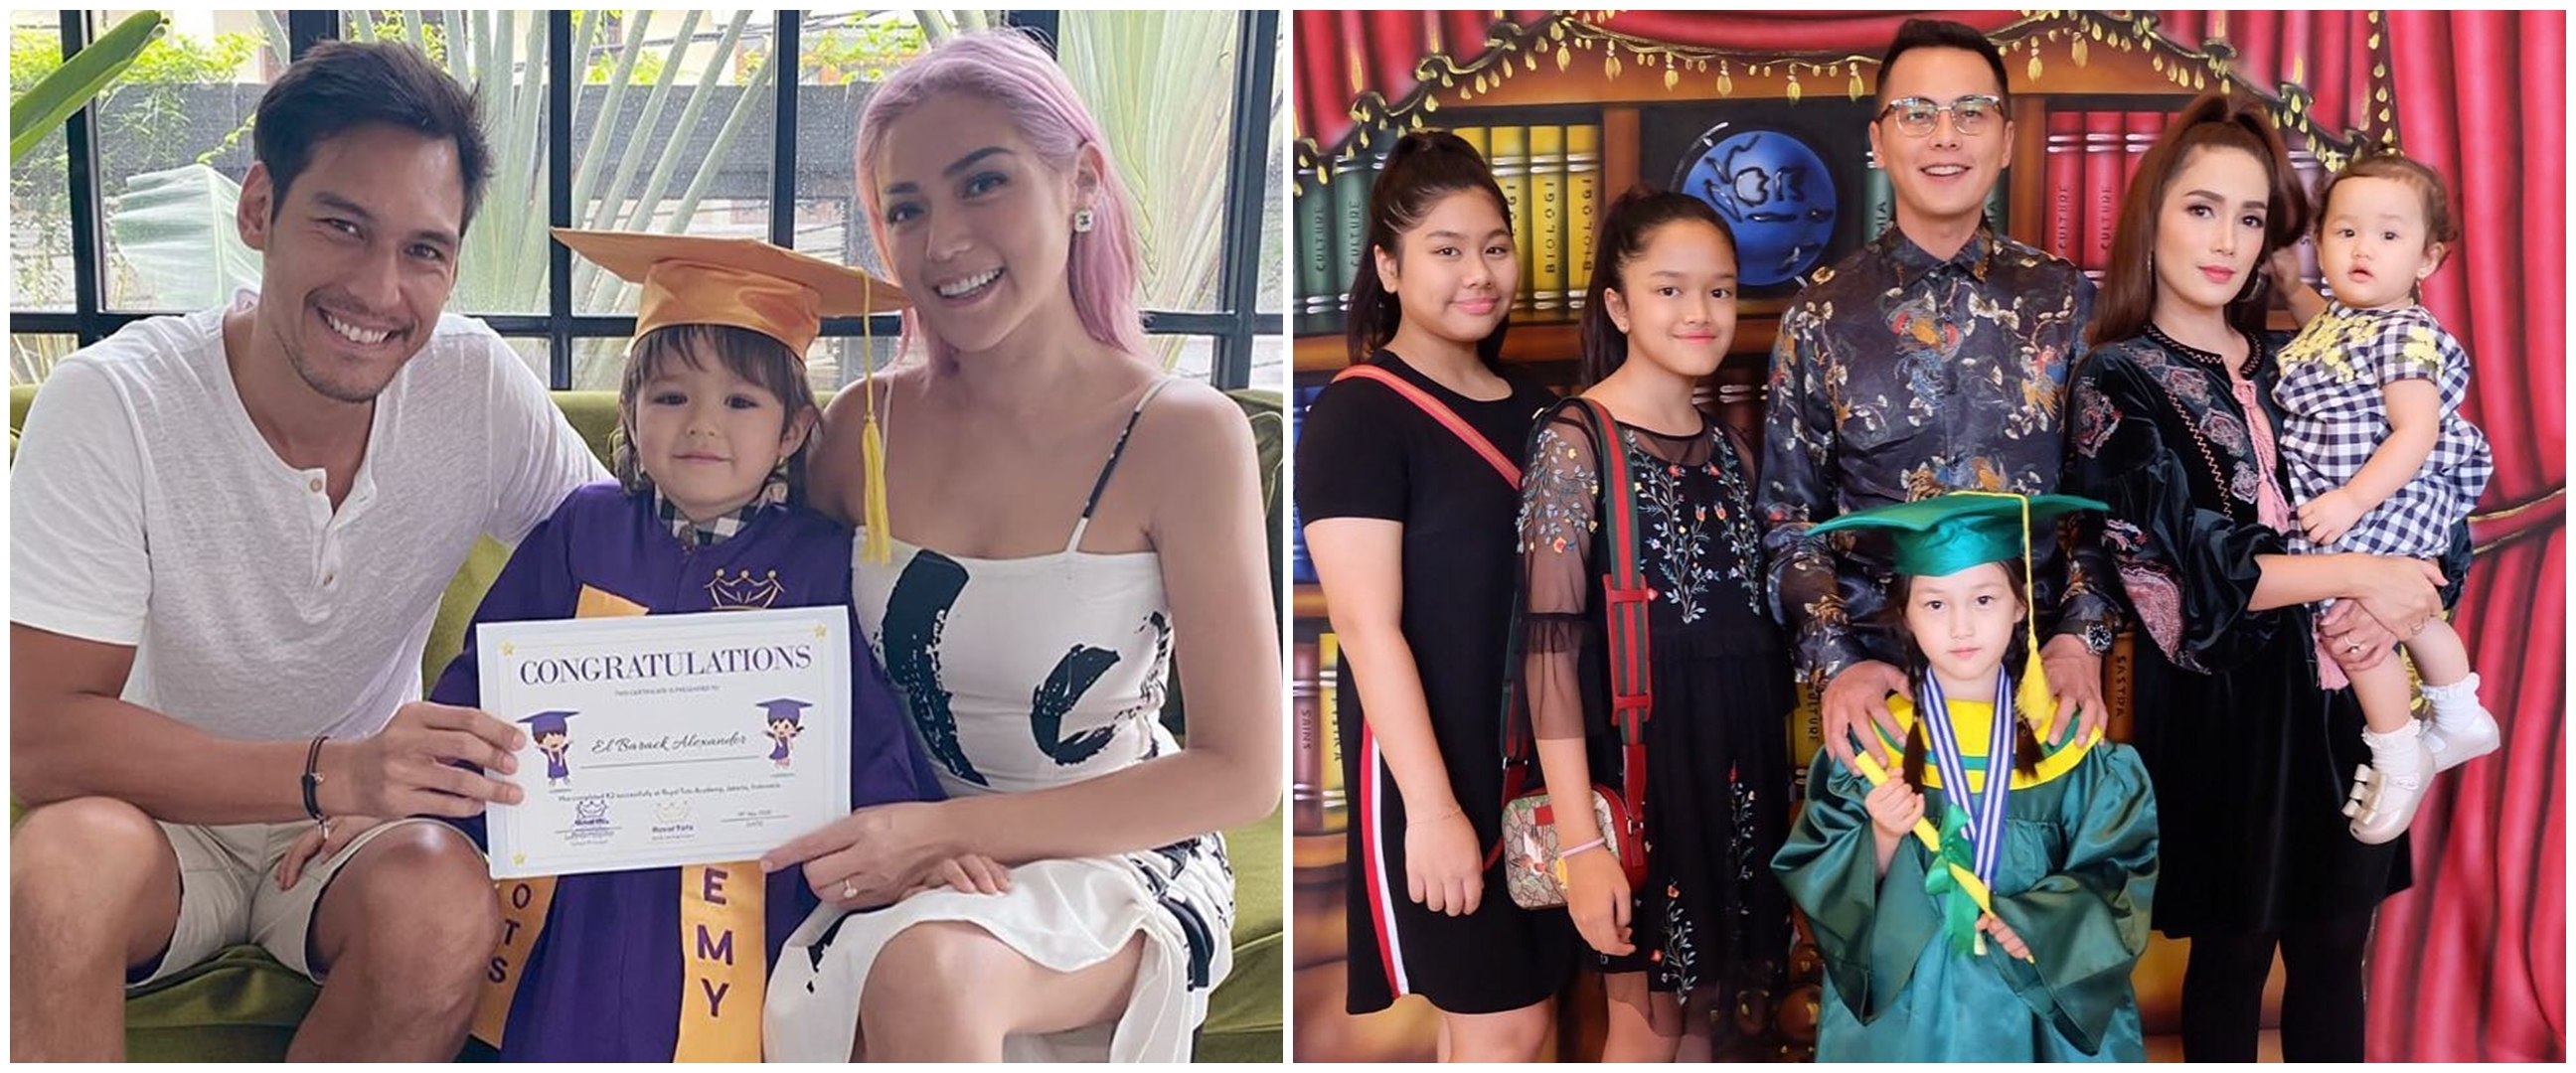 Pesona 7 seleb hadiri wisuda anak, Jessica Iskandar jadi sorotan